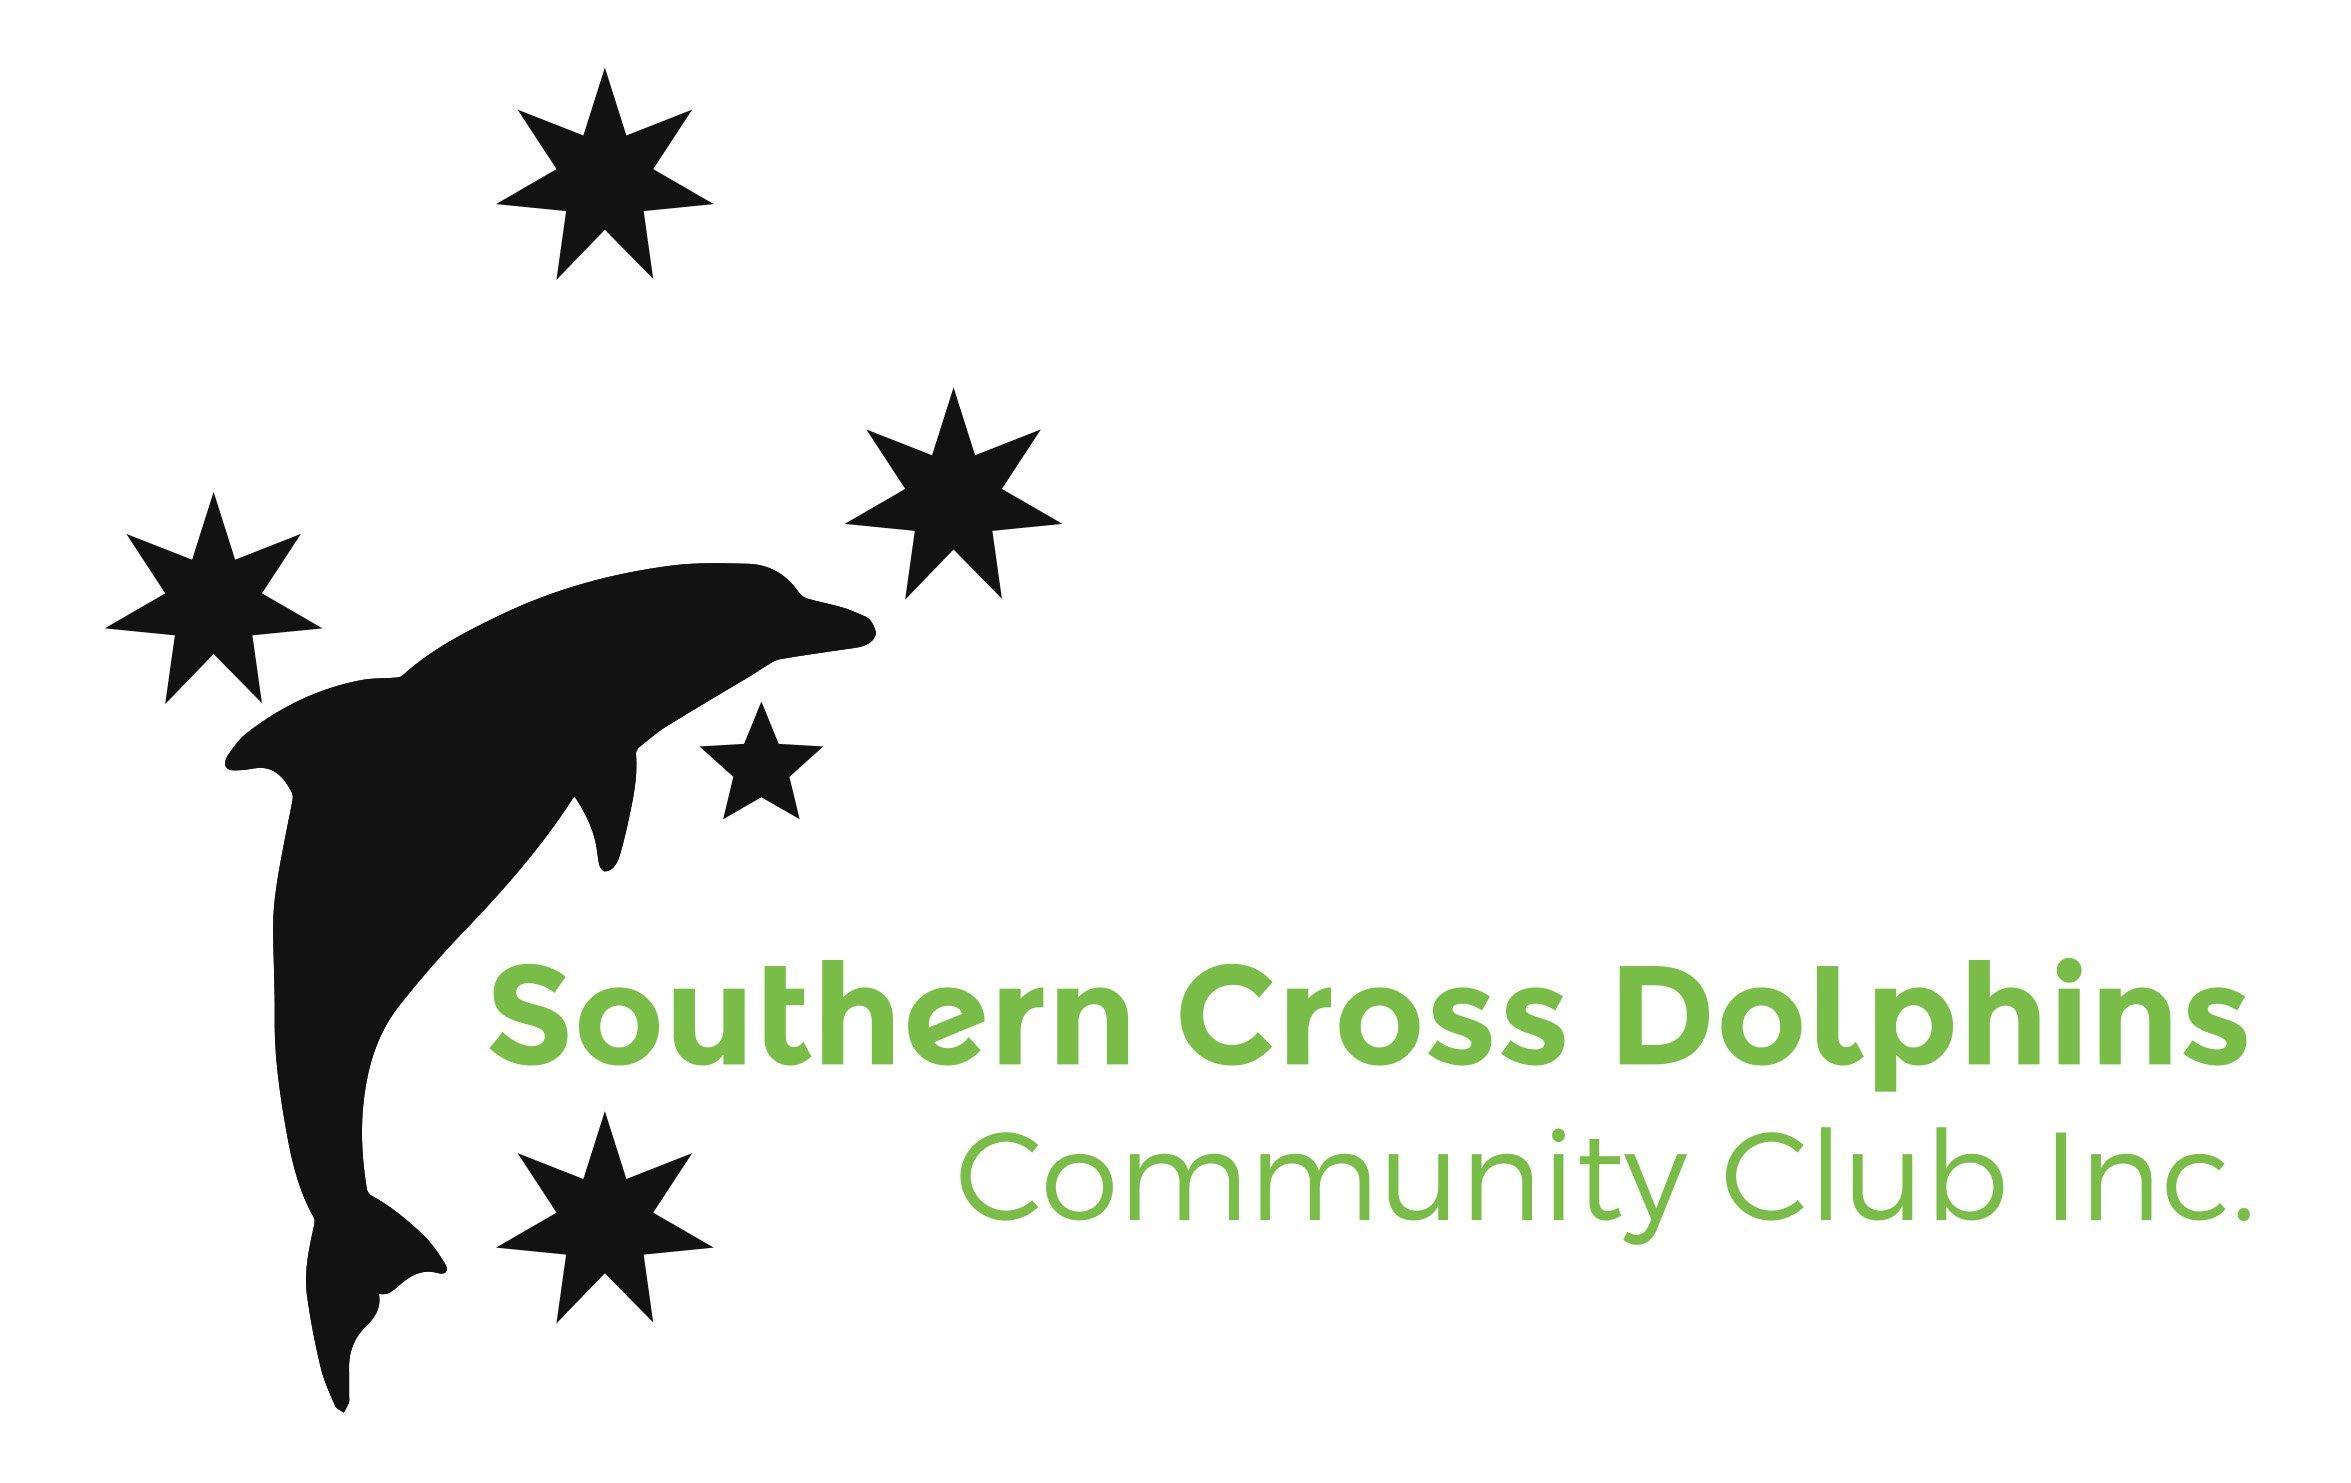 Southern Cross Dolphins Community Club Inc.